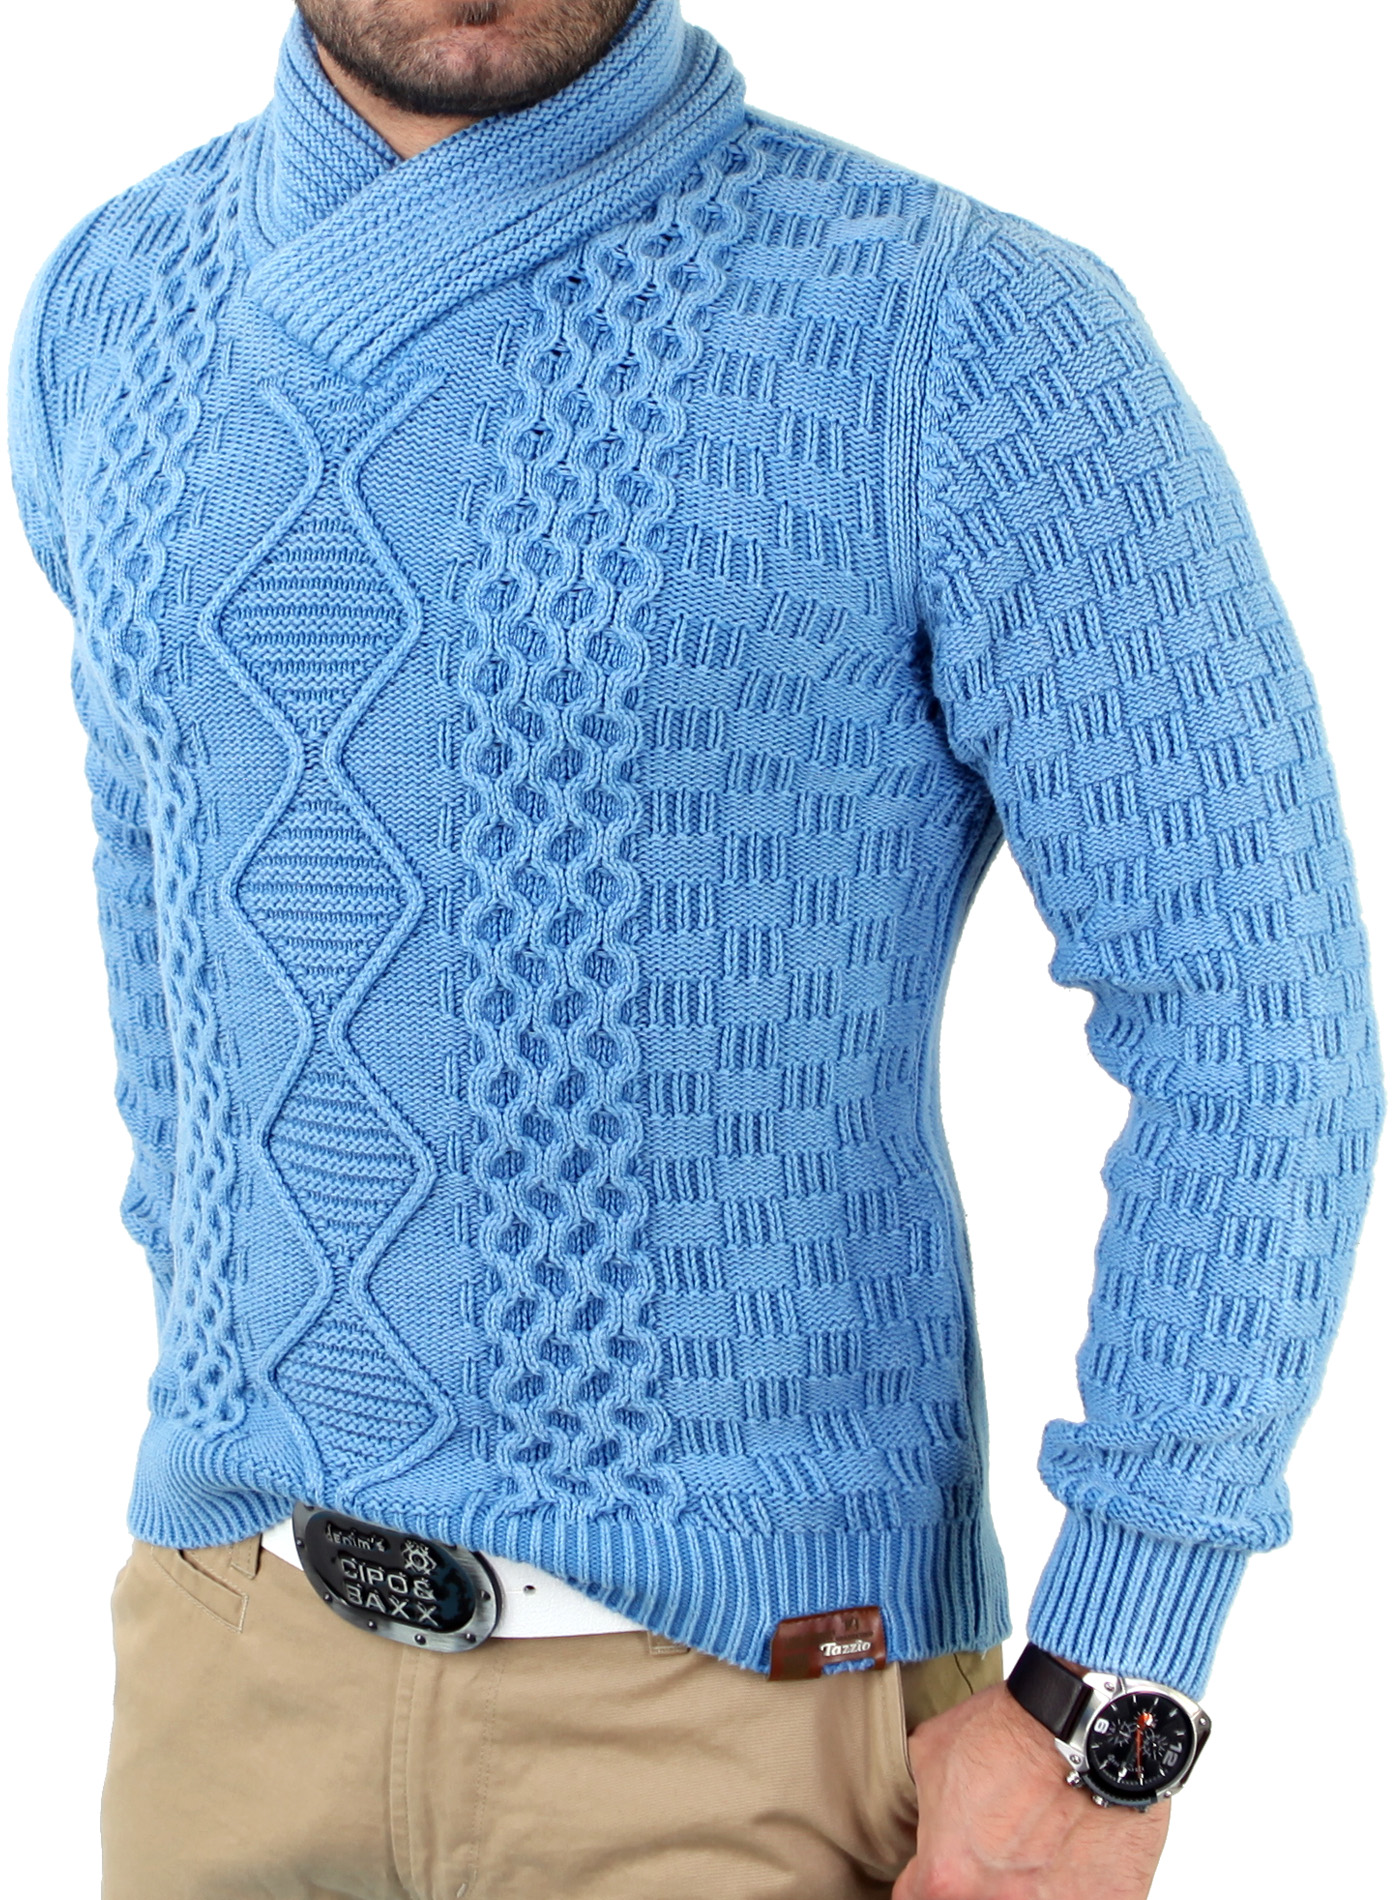 tazzio tz 409 herren winter vintage schalkragen strick pullover sweatshirt jacke ebay. Black Bedroom Furniture Sets. Home Design Ideas